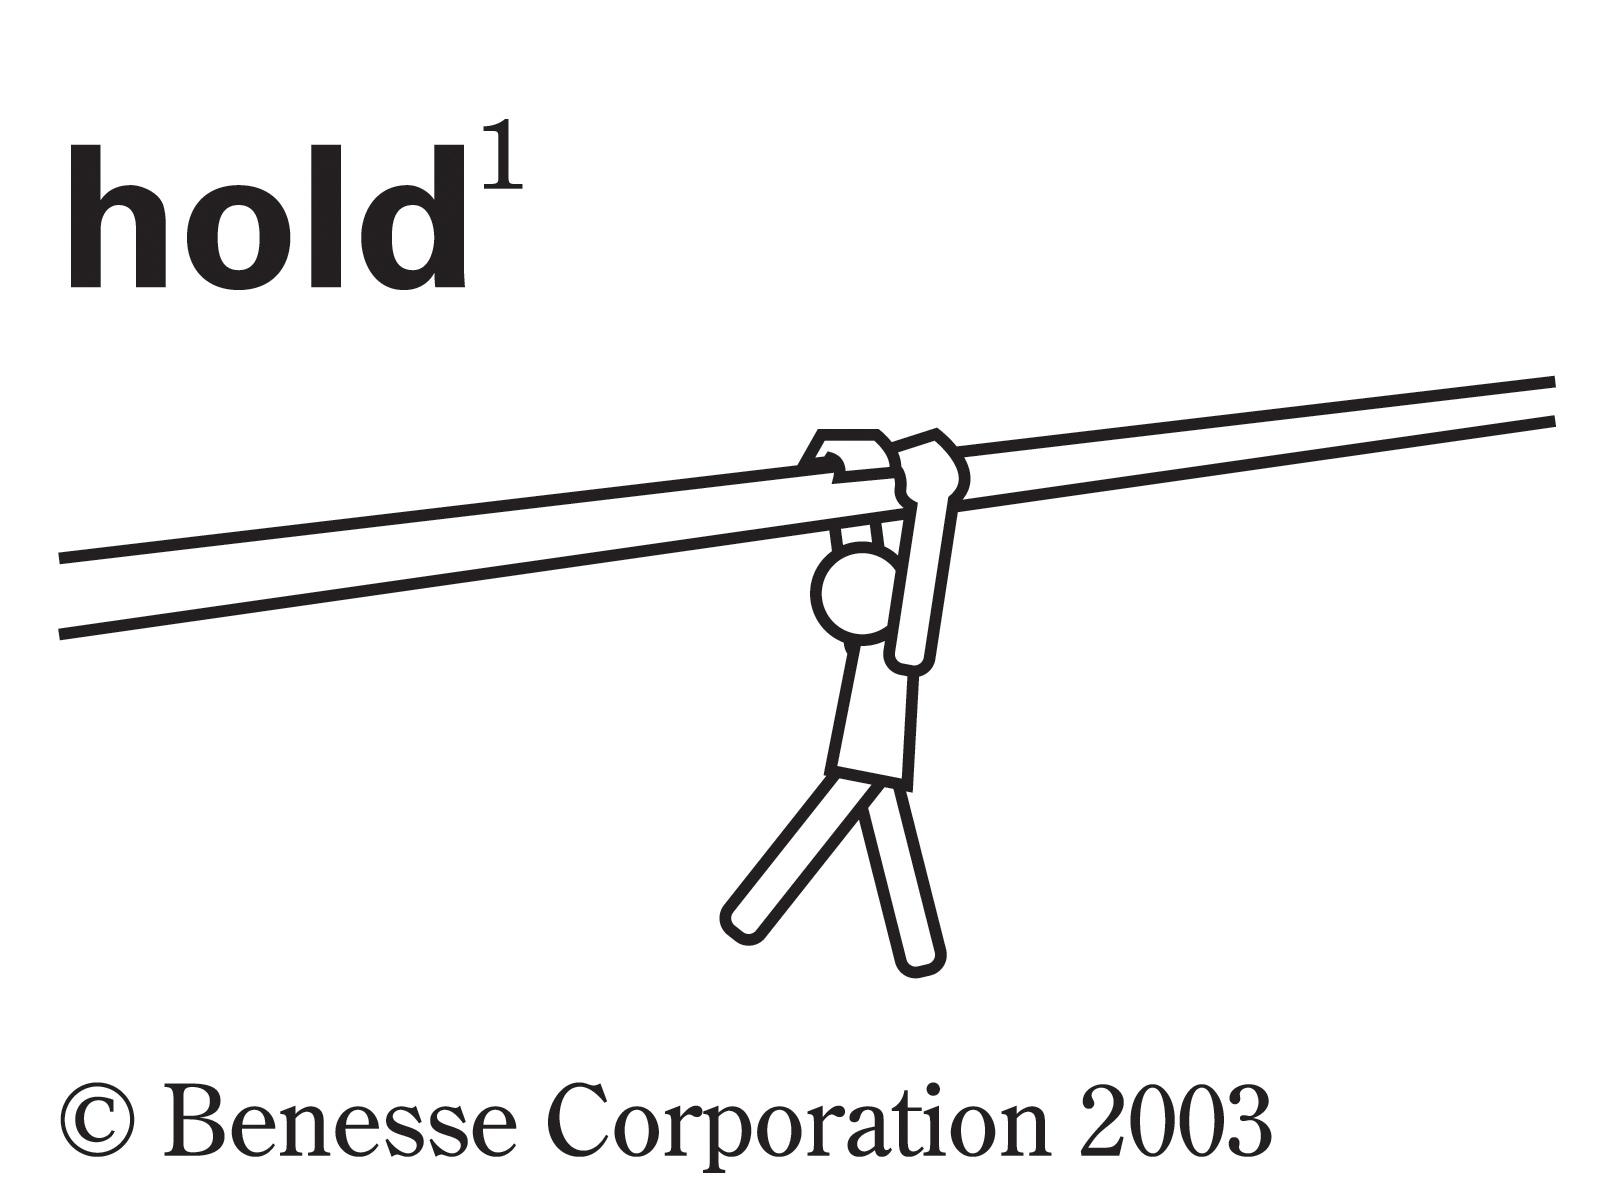 hold02.jpg